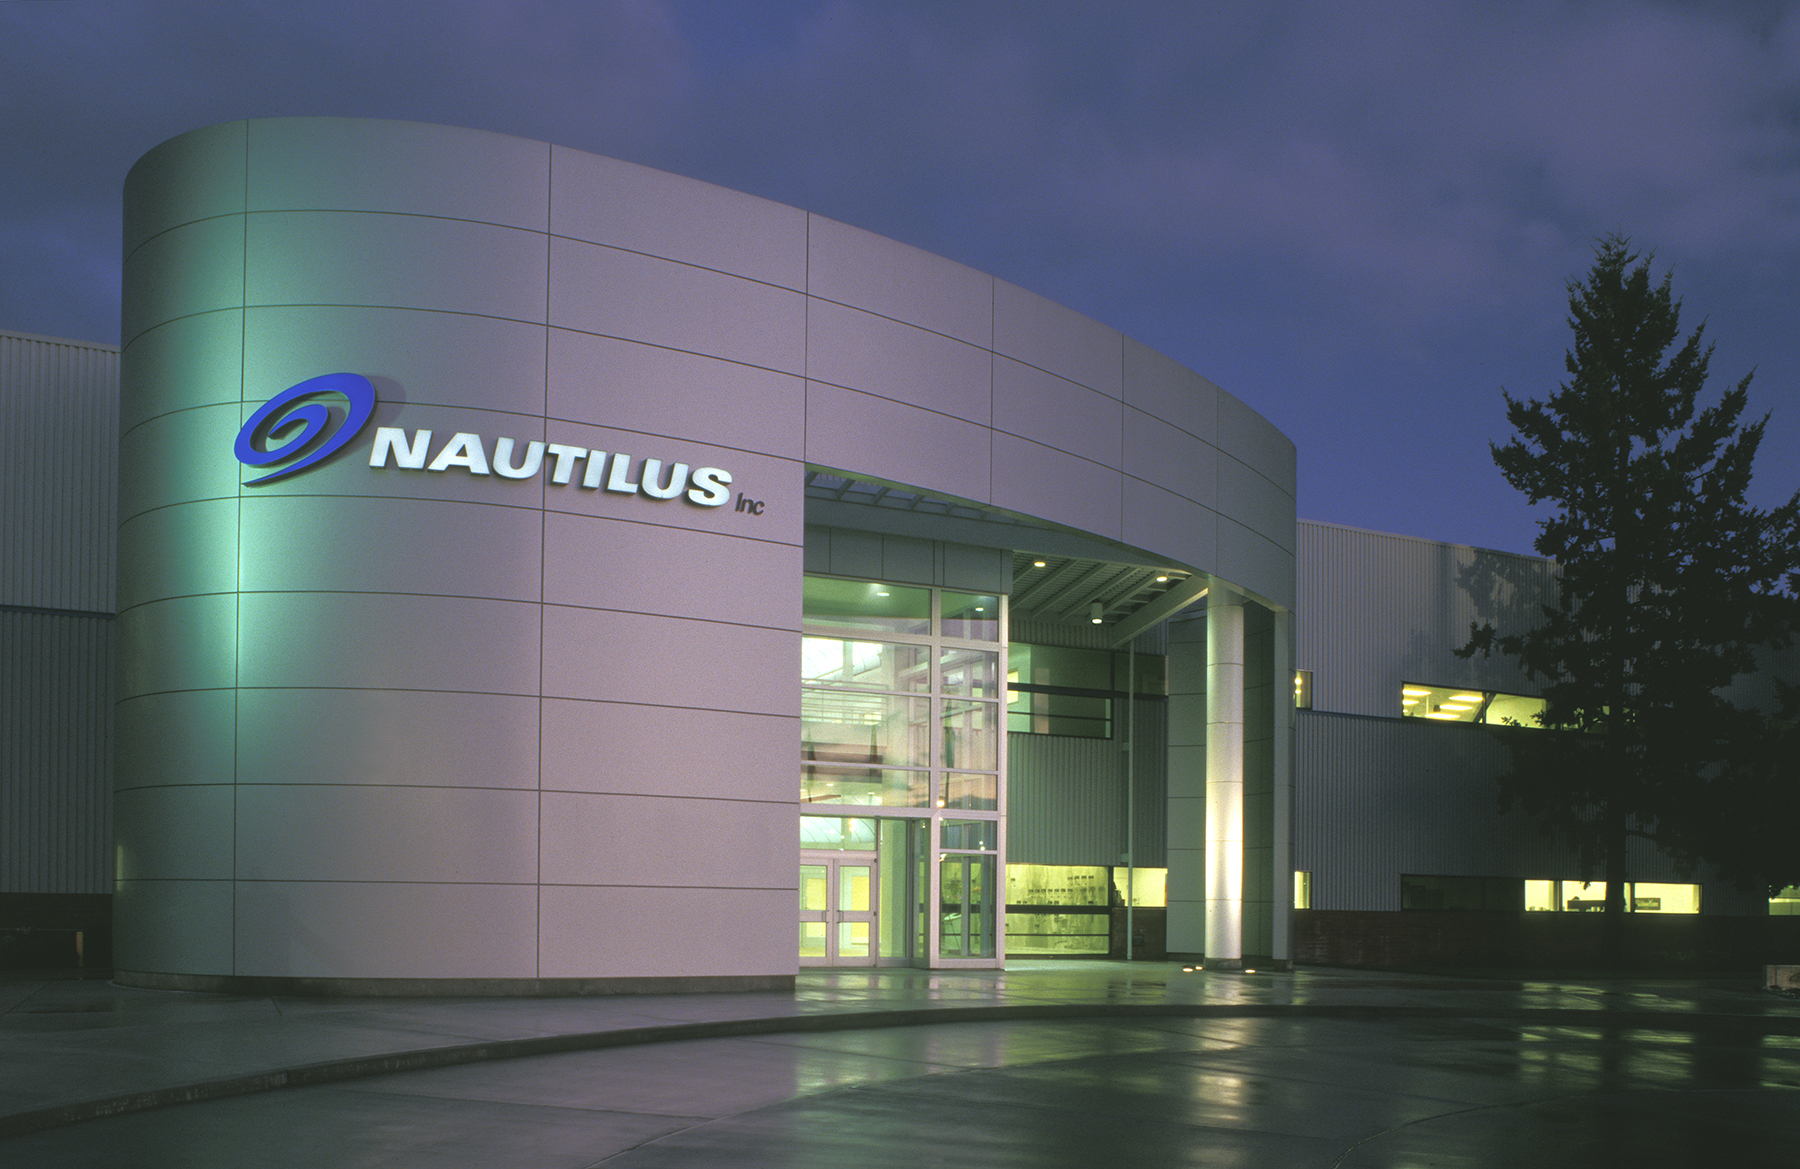 Nautilus_Ext_01.jpg